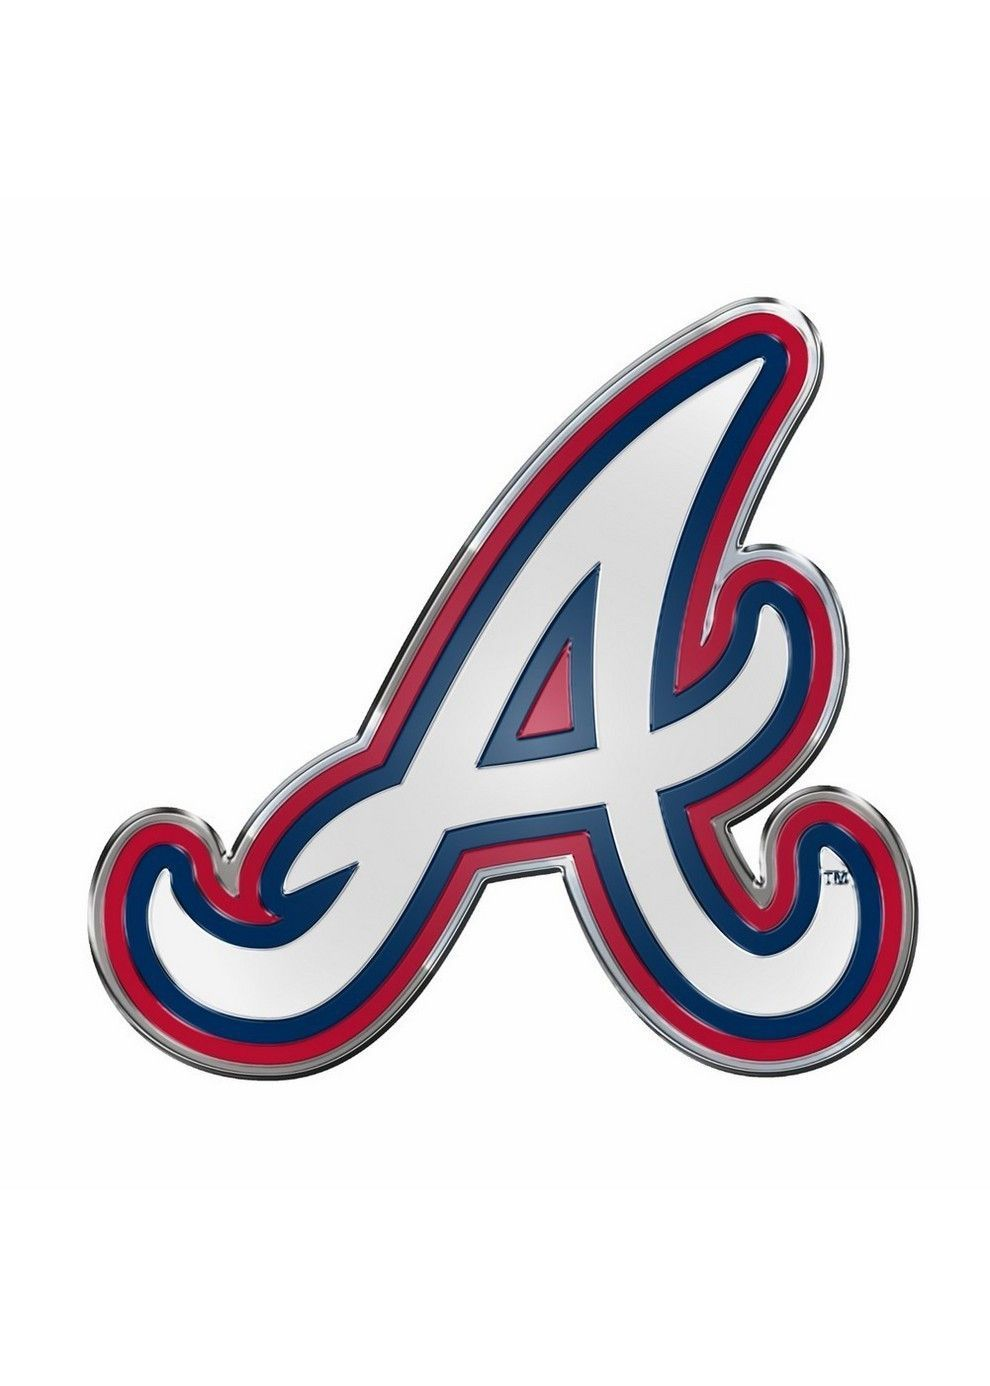 Atlanta Braves Color Auto Emblem Atlanta Braves Wallpaper Atlanta Braves Braves